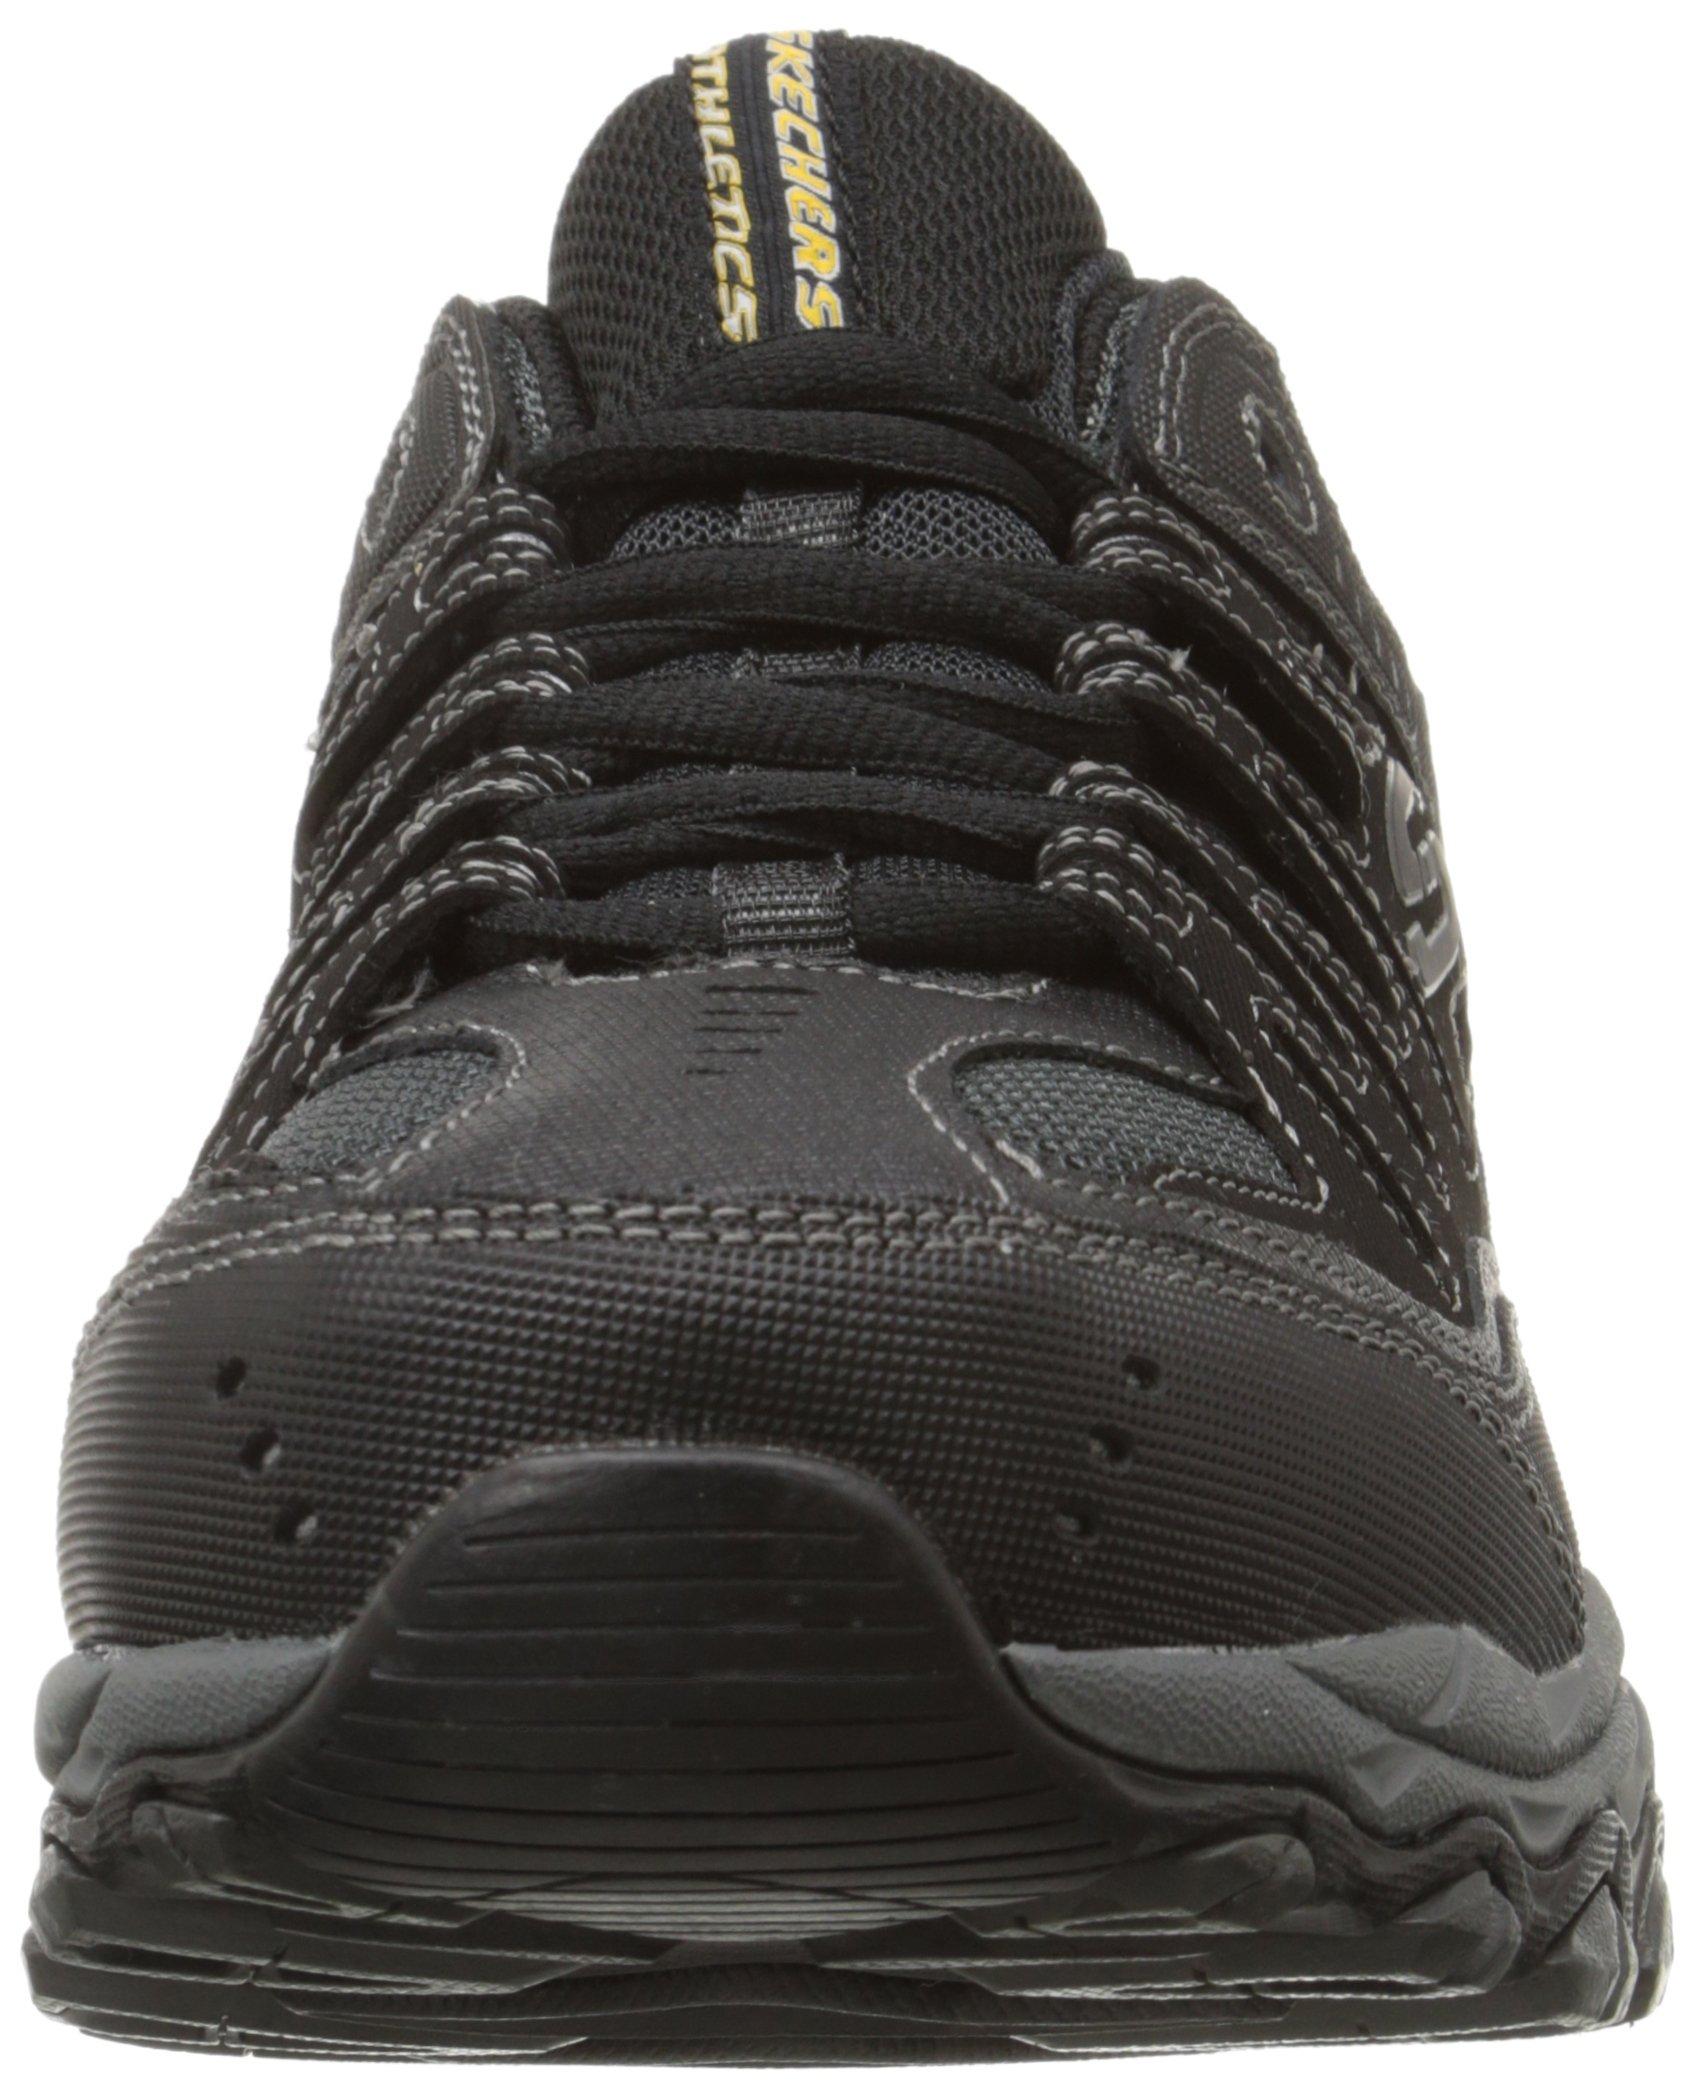 Skechers Men's AFTERBURNM.FIT Memory Foam Lace-Up Sneaker, Black, 6.5 M US by Skechers (Image #4)